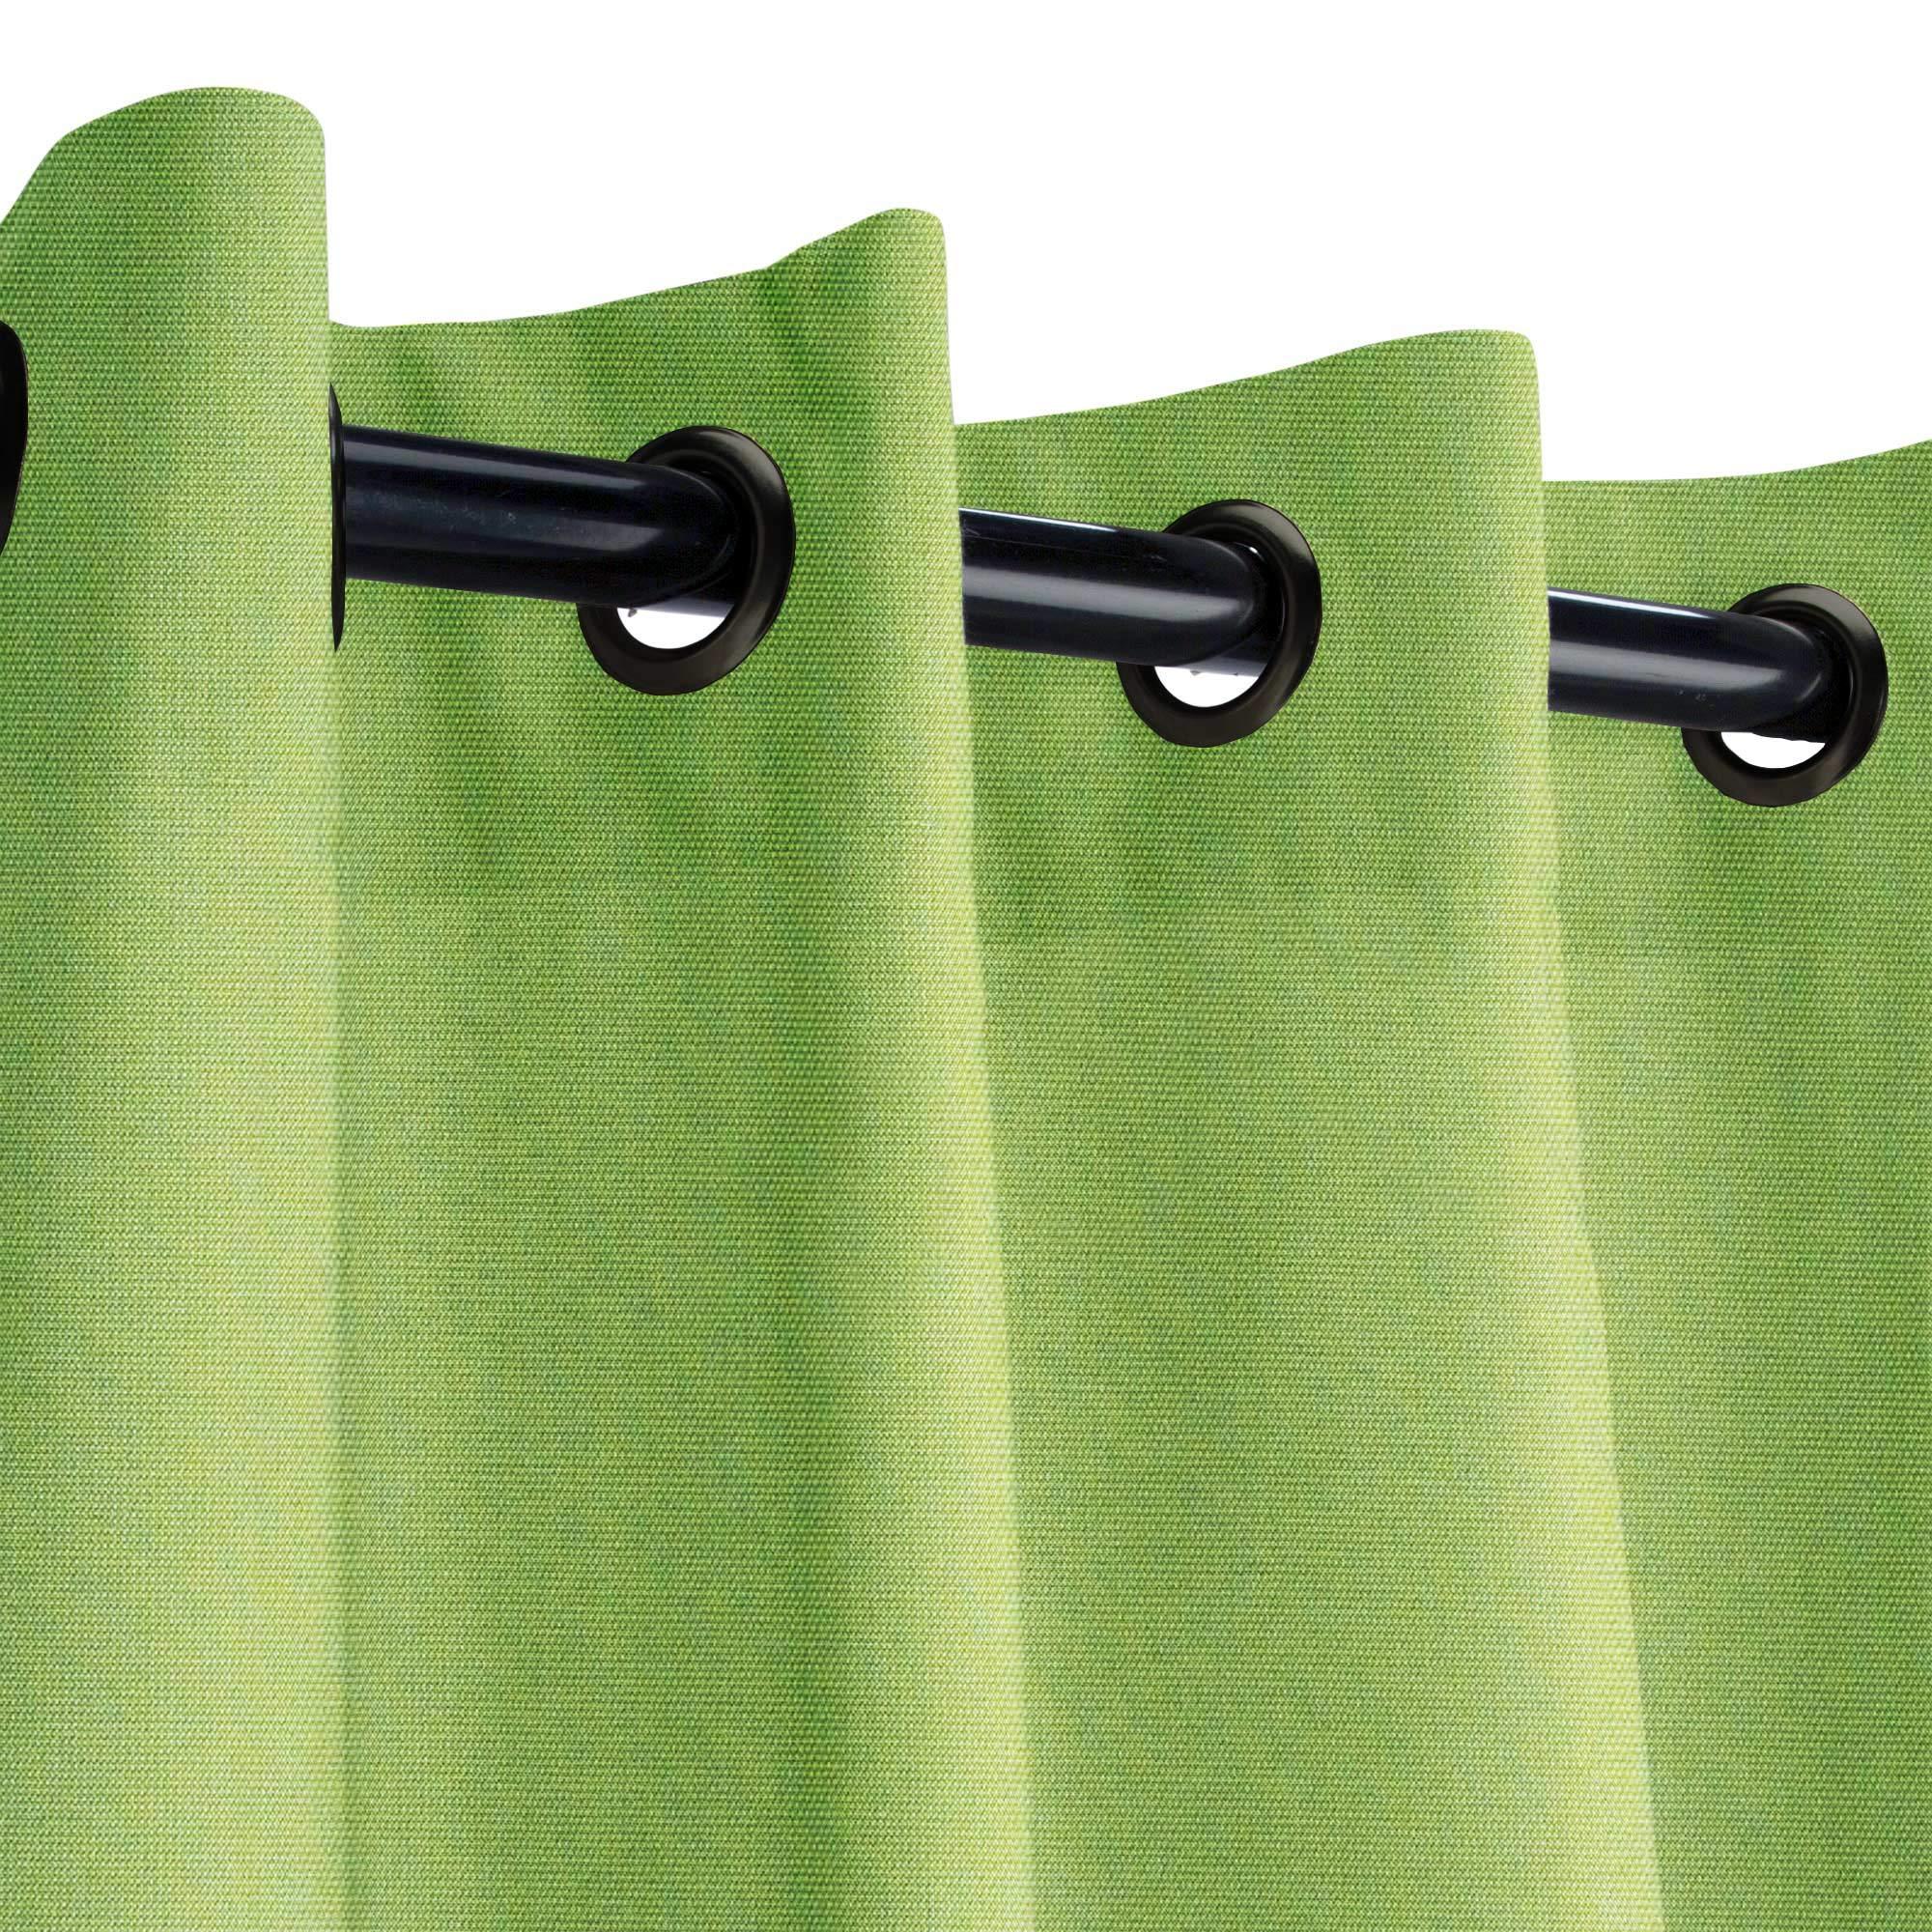 Sunbrella Canvas Ginkgo Outdoor Curtain with Dark Gunmetal Grommets 50 in. Wide x 108 in. Long